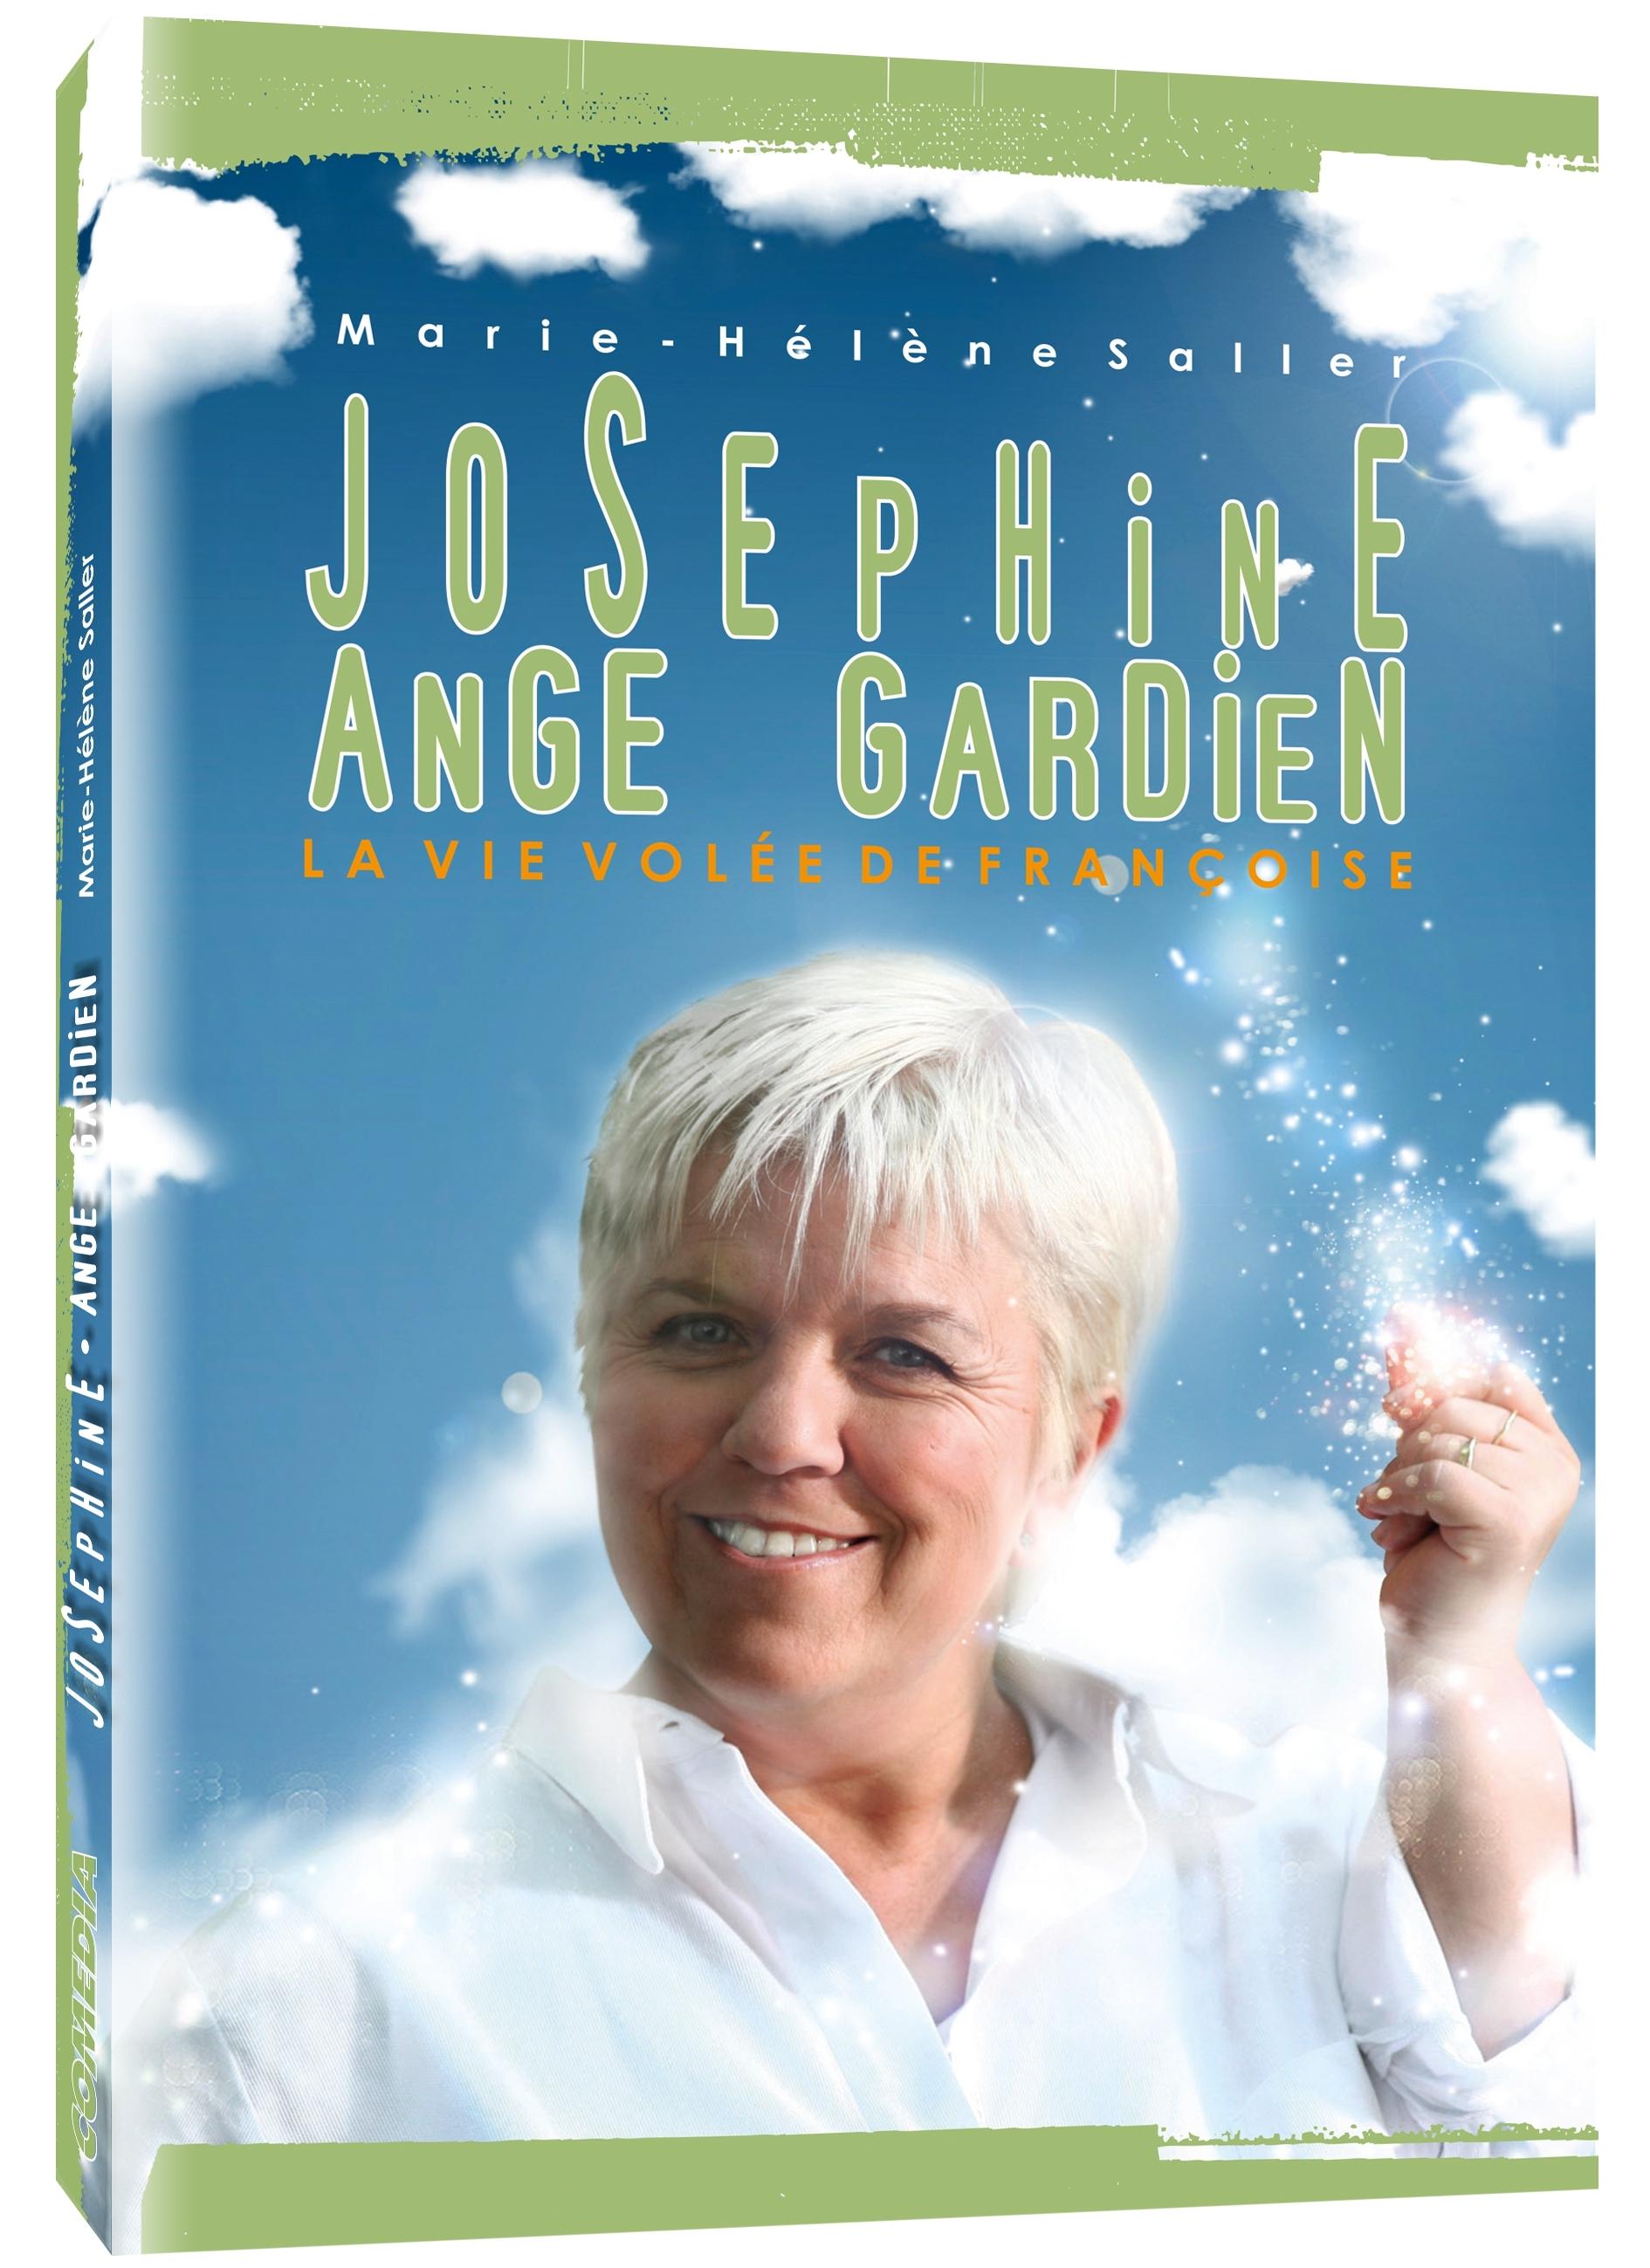 JOSEPHINE ANGE GARDIEN - ROMAN PERSONNALISE